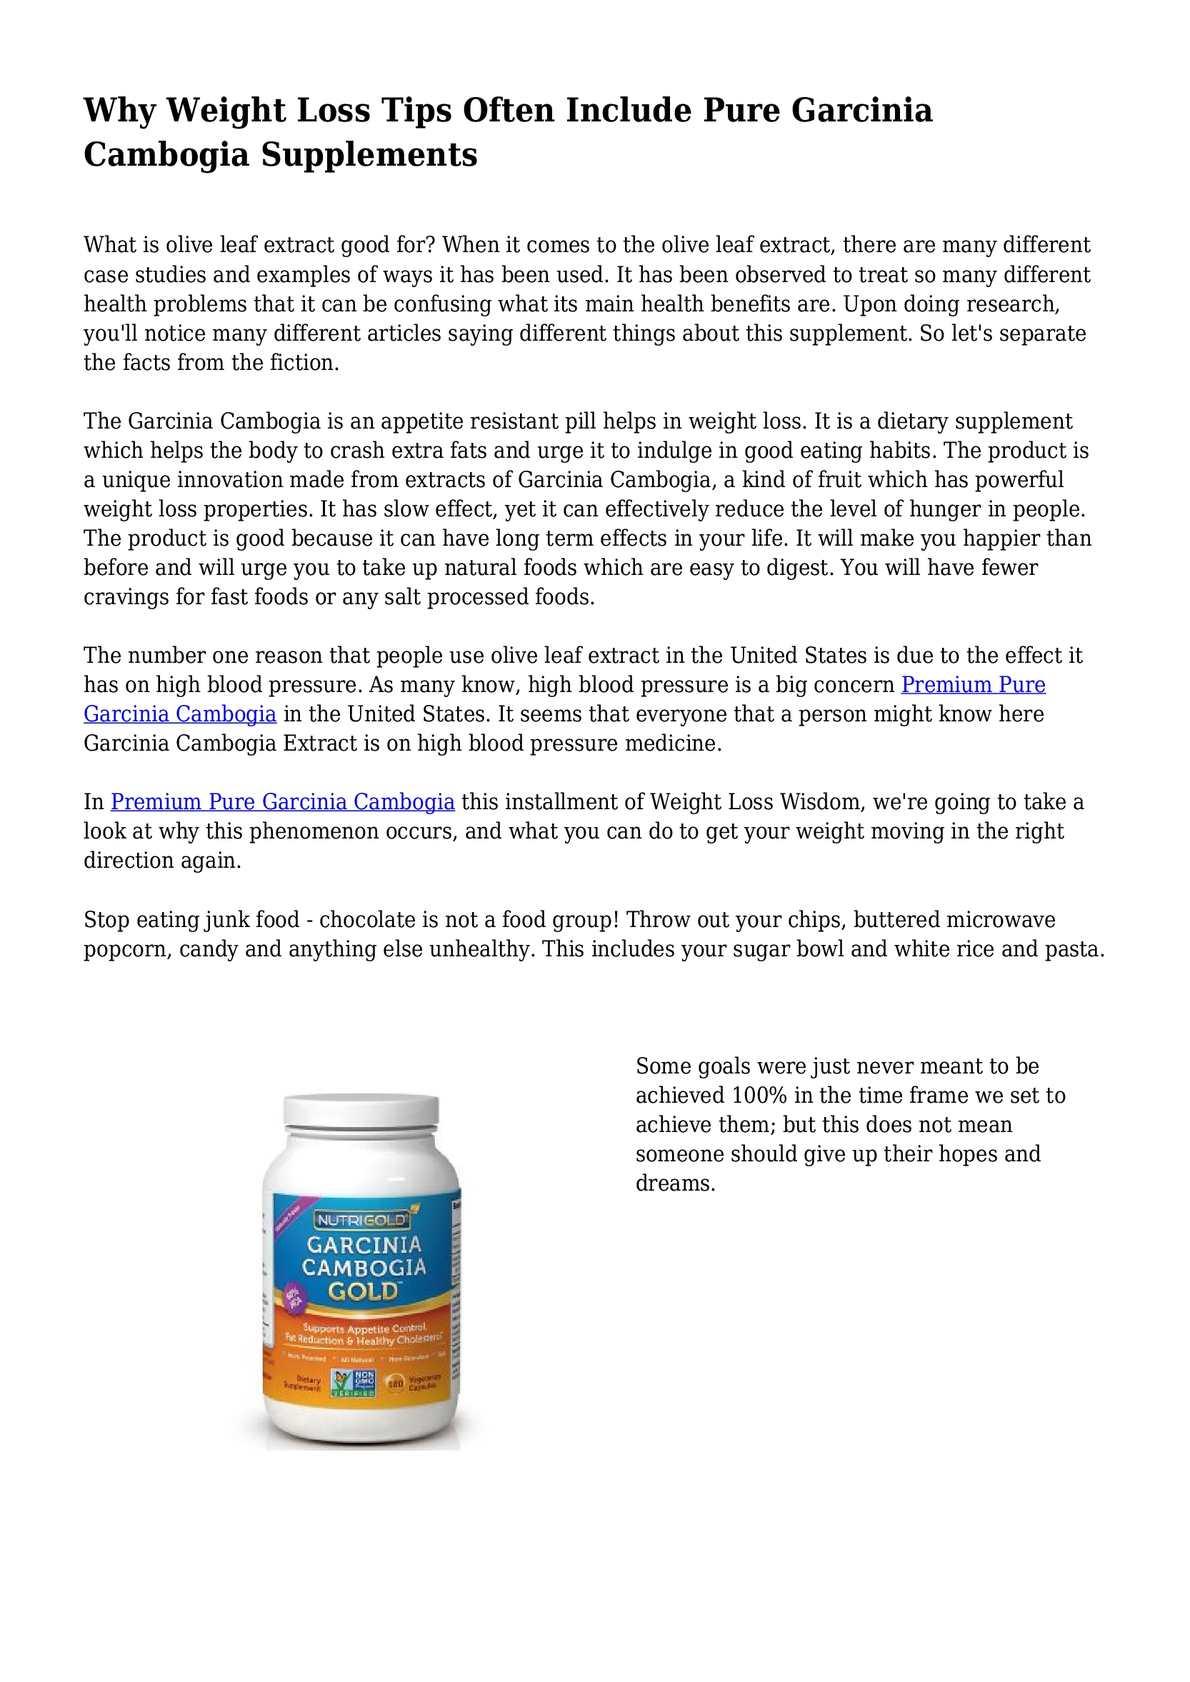 garcinia cambogia lower blood pressure